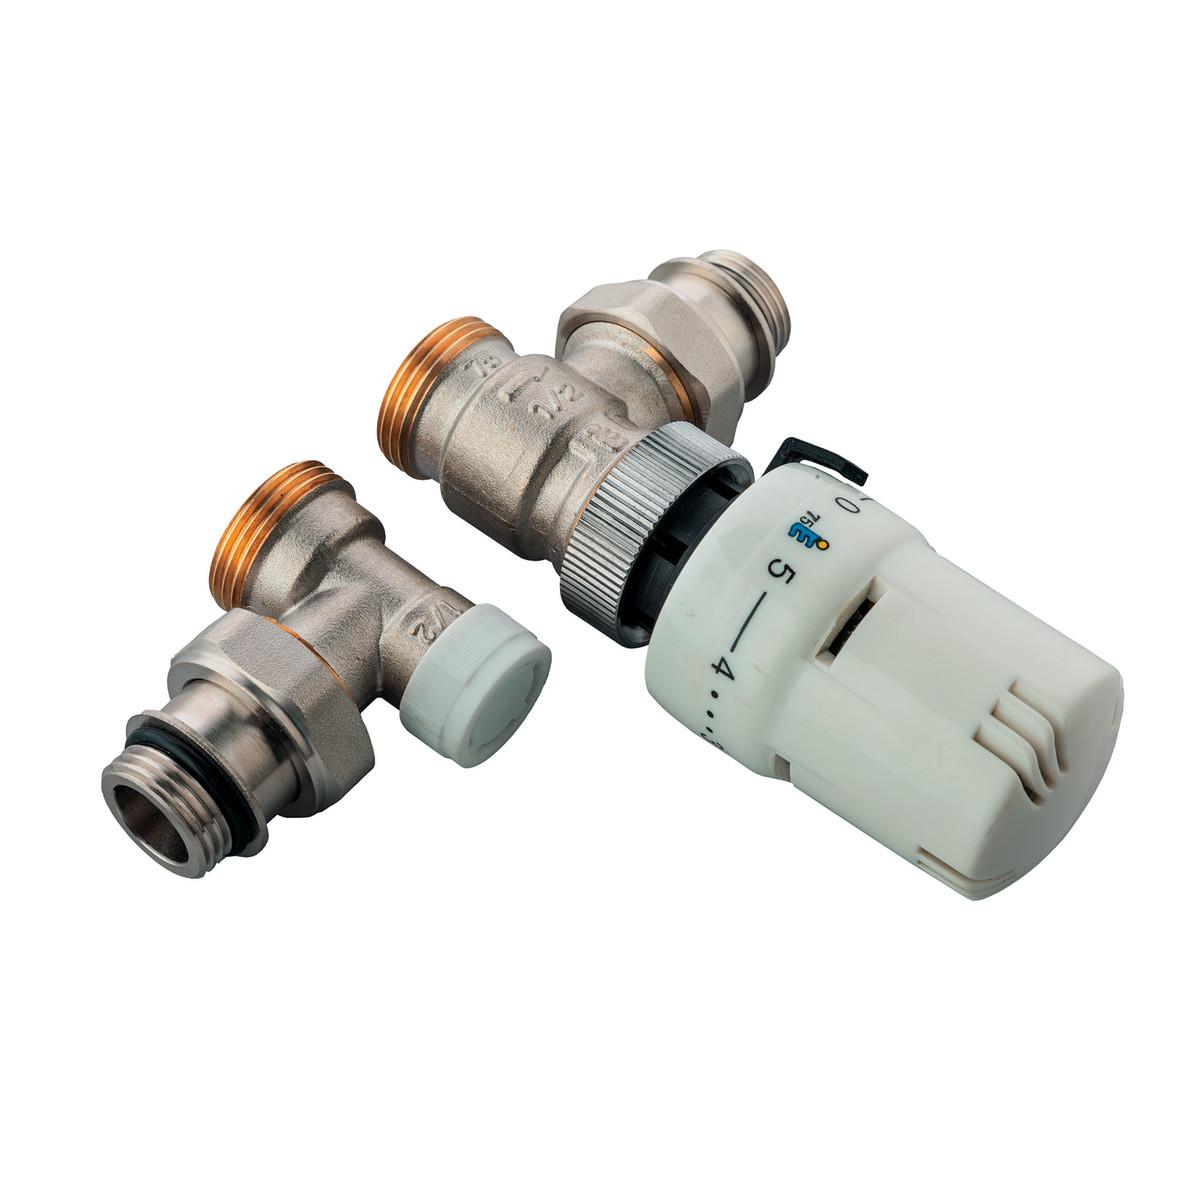 valvola elettronica termostatica salus ph 60 cromata